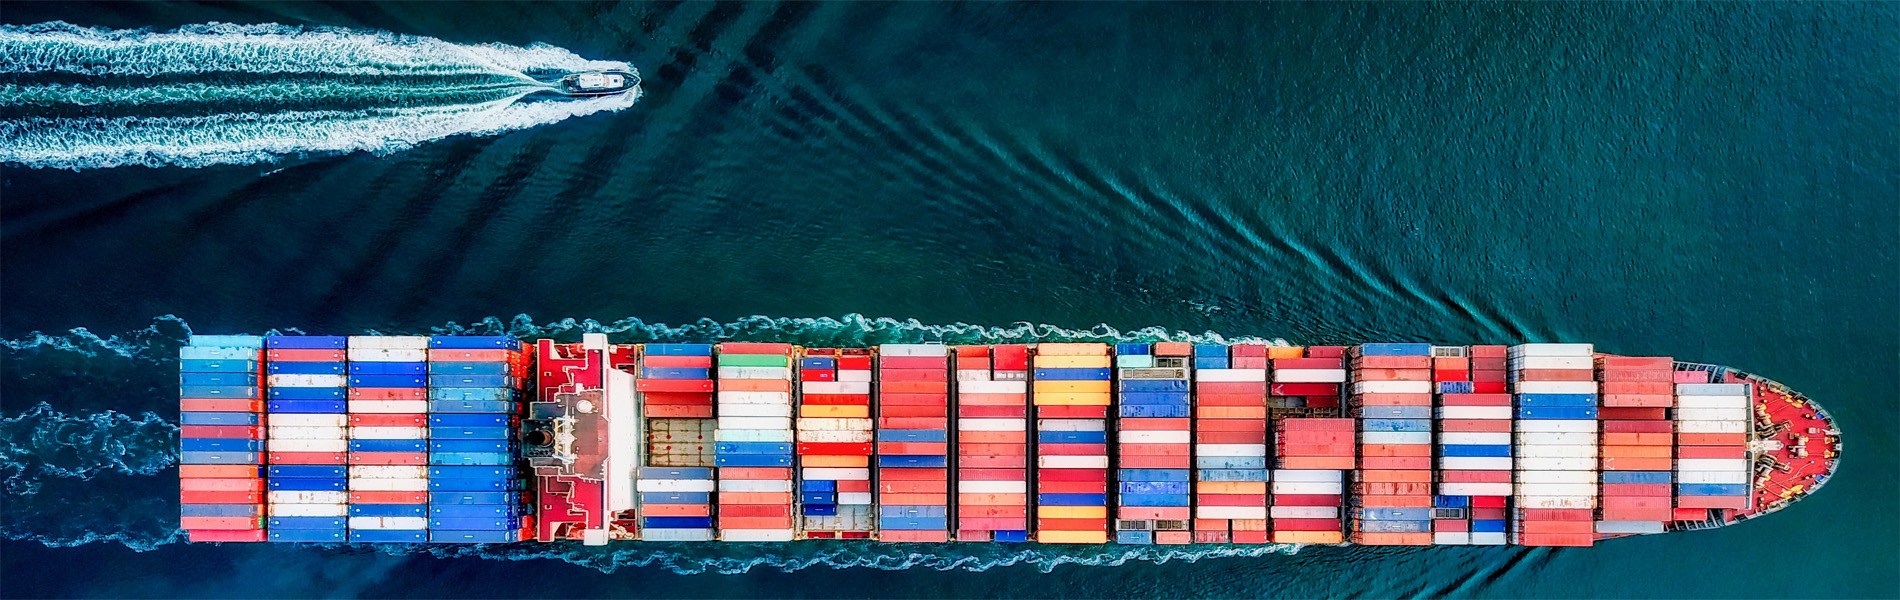 Shoham Shipping Company in Cyprus